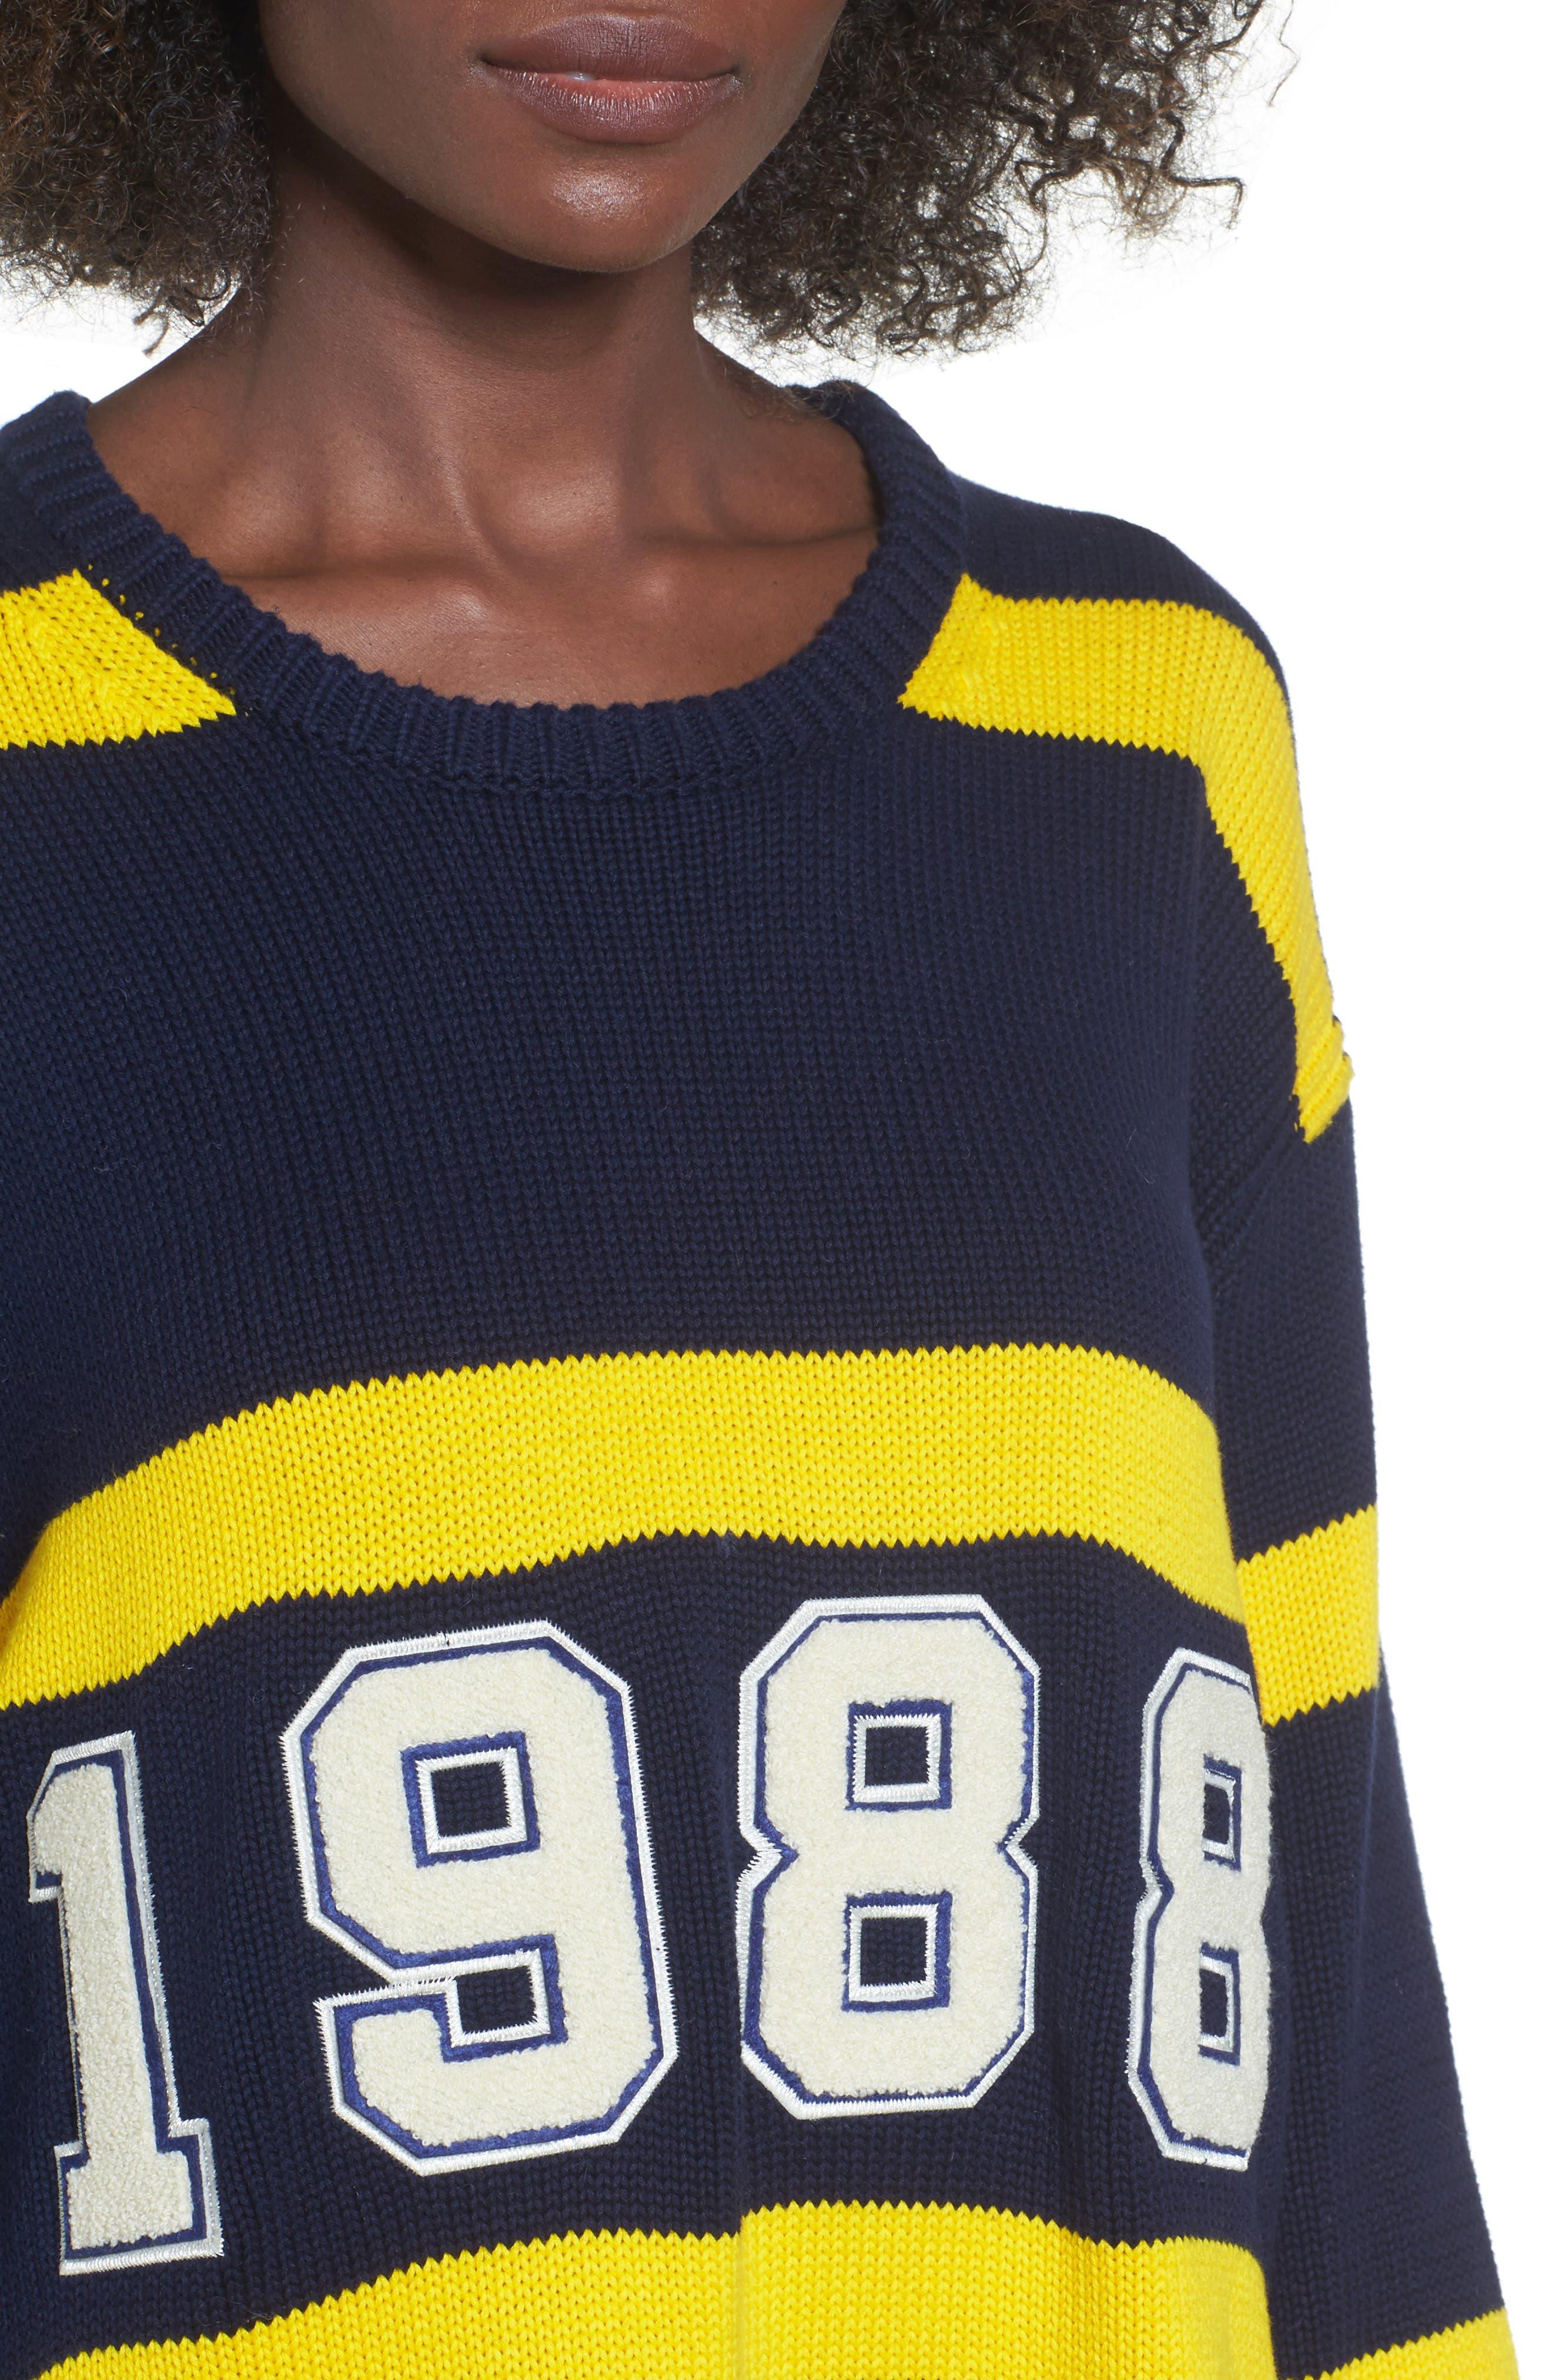 PUMA by Rihanna Longline Stripe Sweater,                             Alternate thumbnail 4, color,                             Navy/ Yellow Stripe